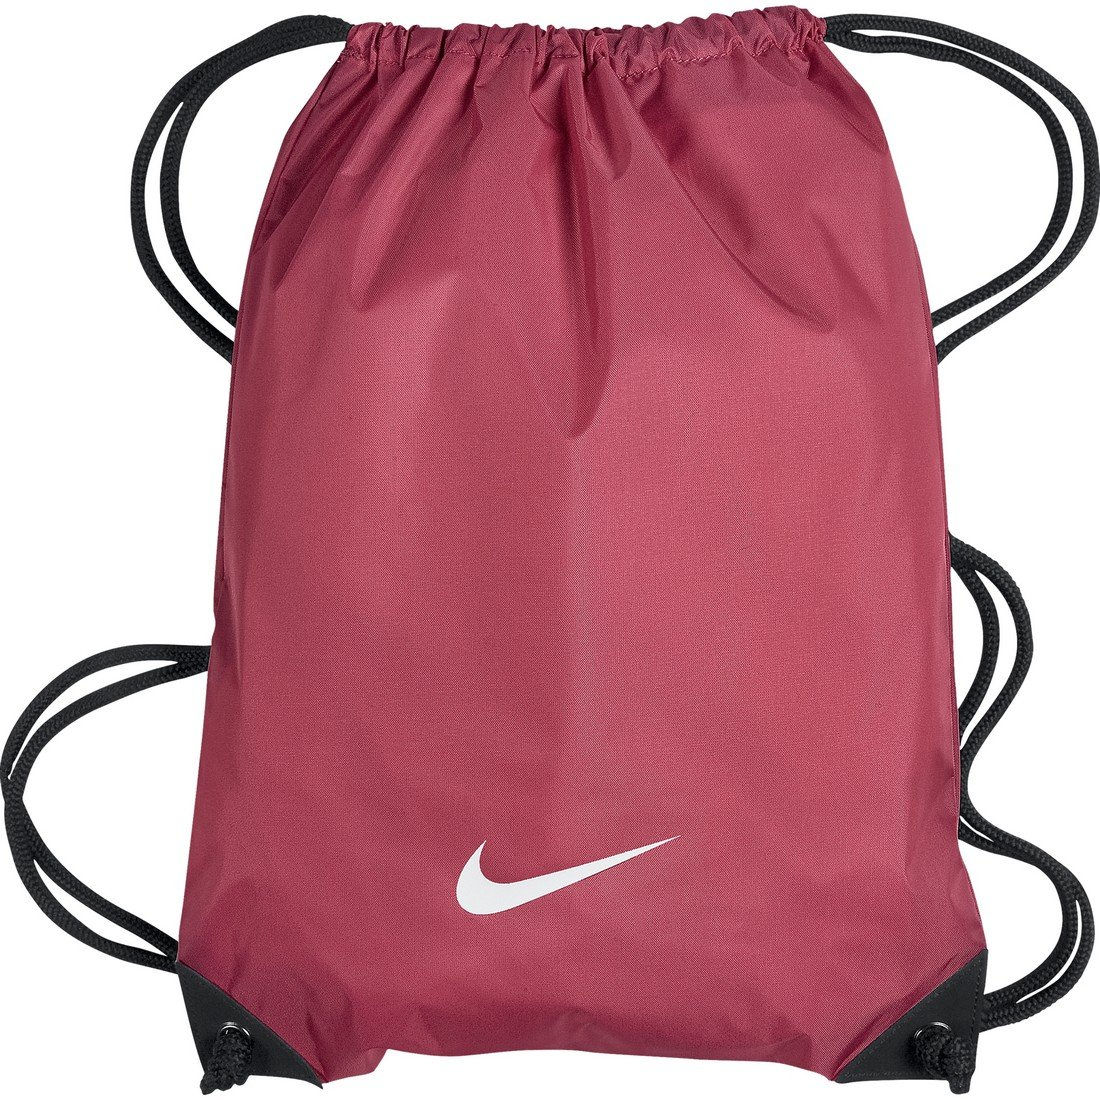 b3a36655764 Nike Heritage Drawstring Sackpack Gym Bag, Blue Lagoon Pink Pow